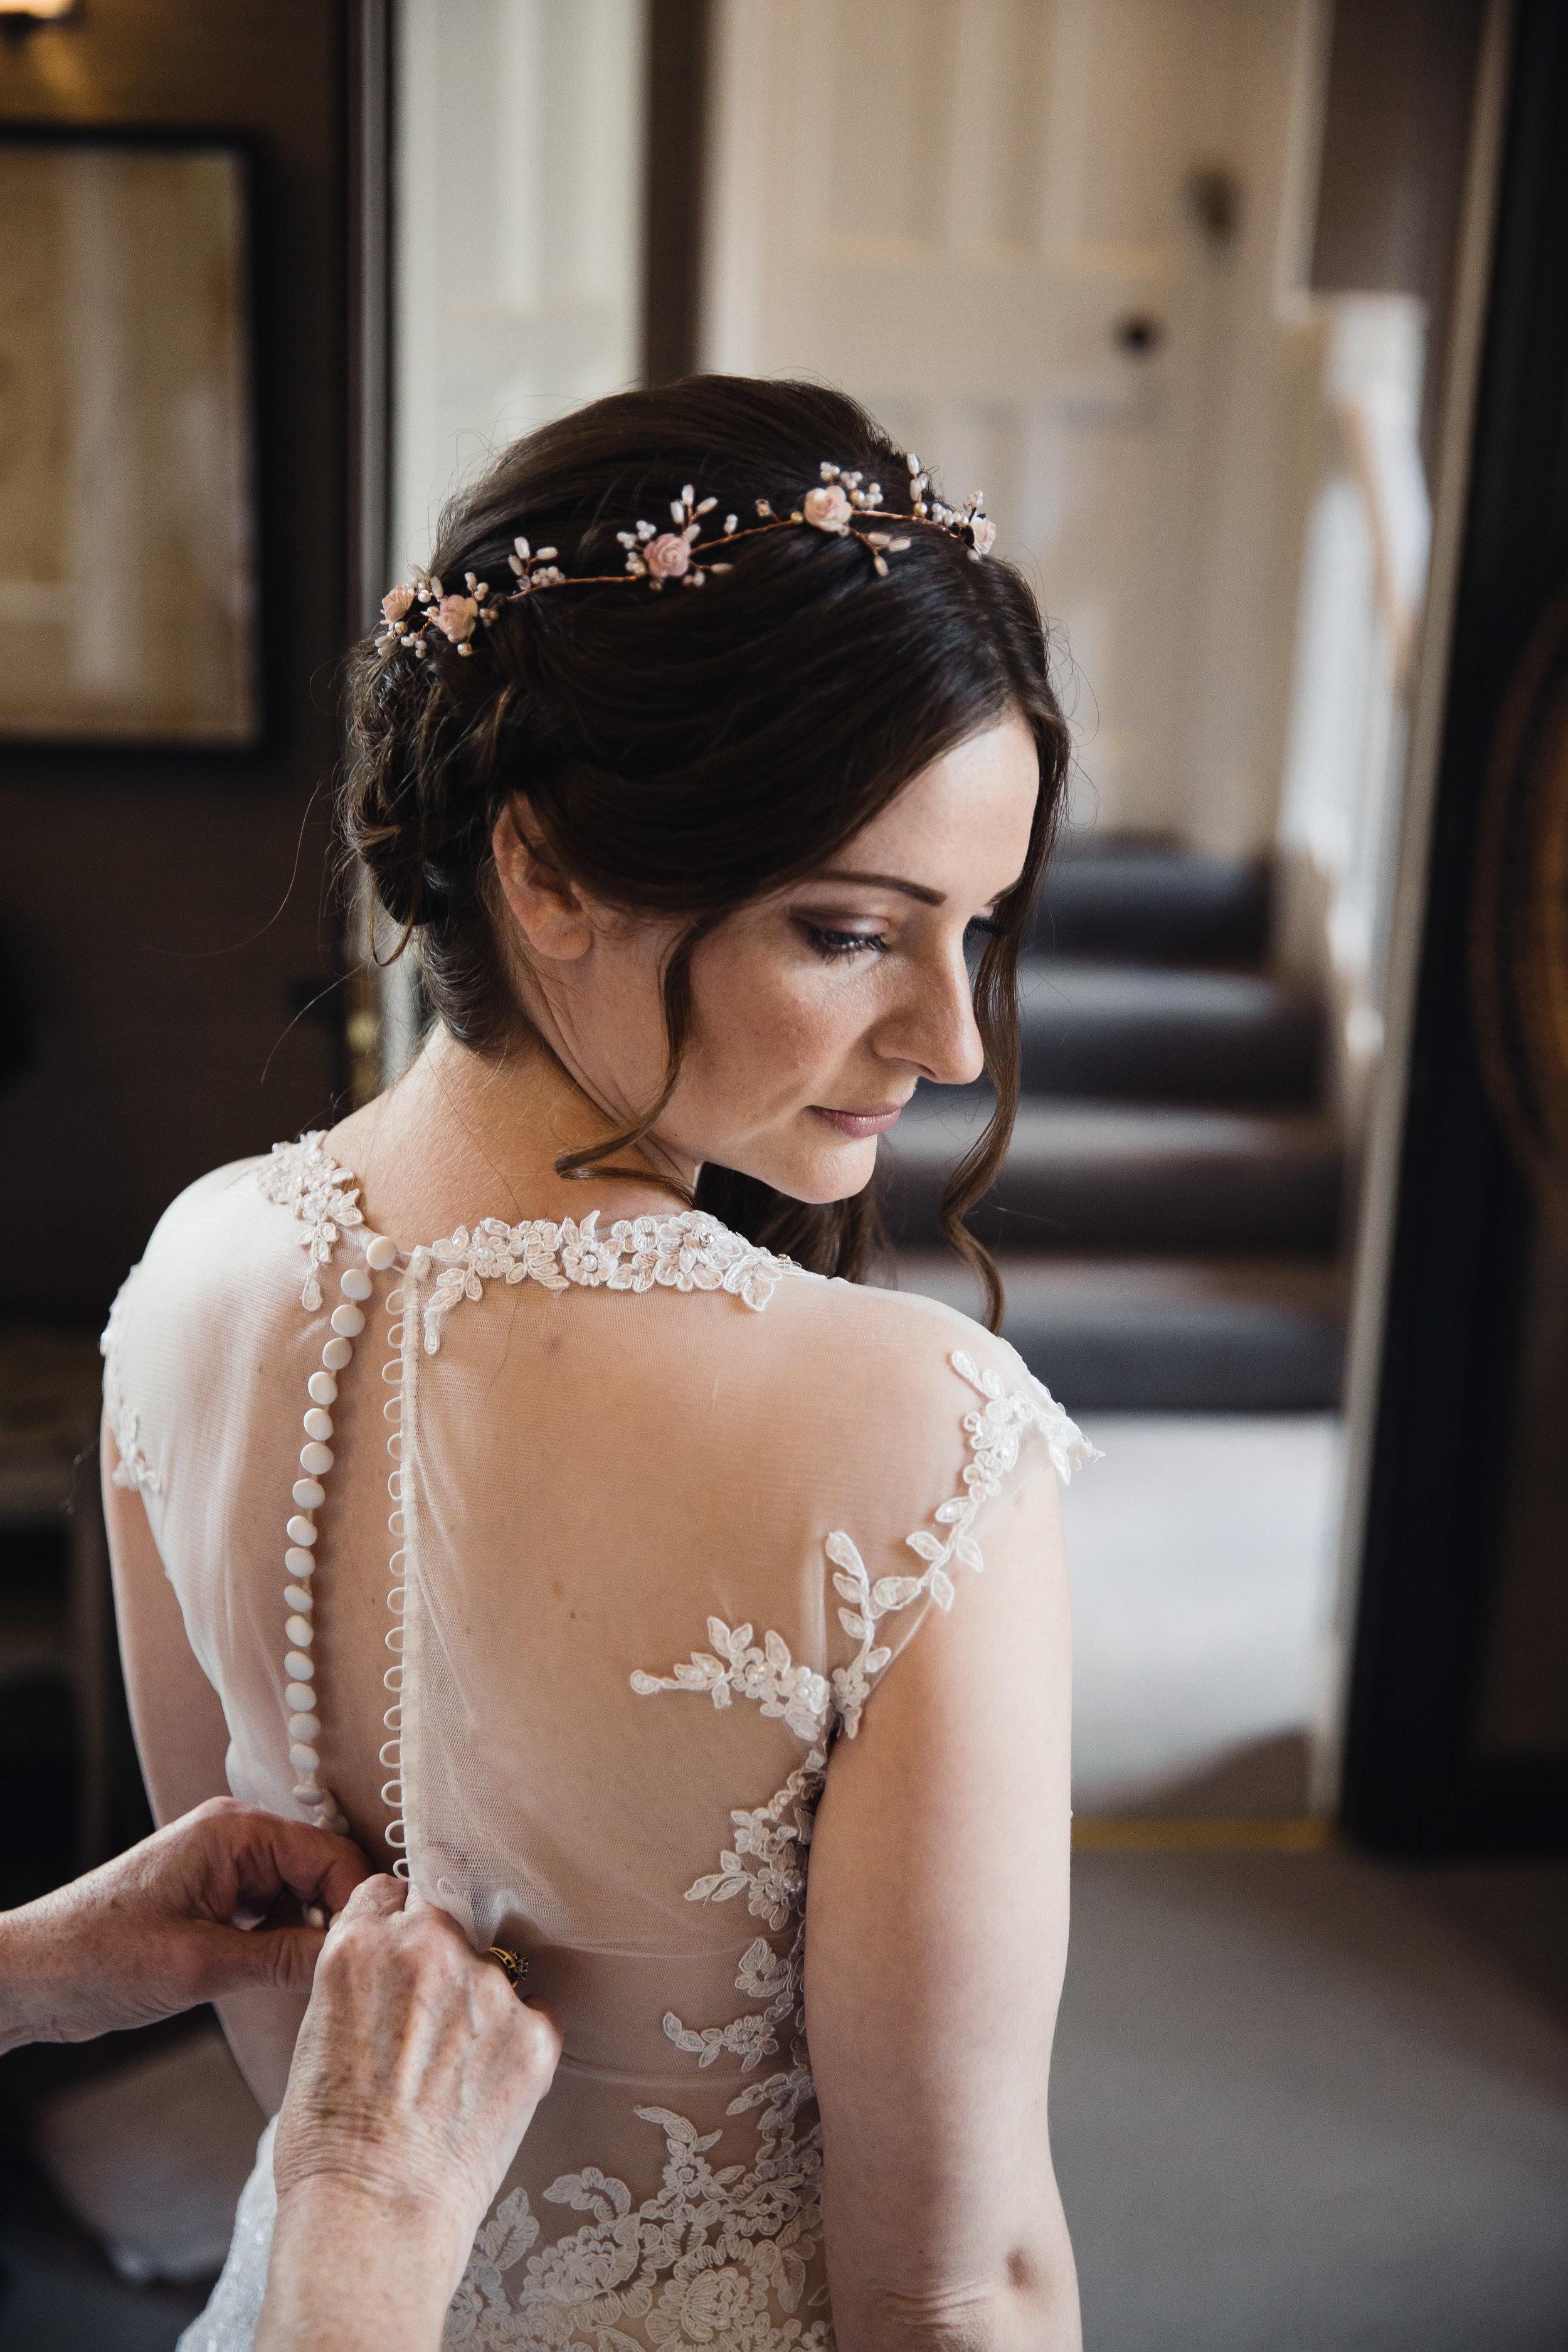 Bride in wedding dress at Falcon Manor Wedding Photography Yorkshire